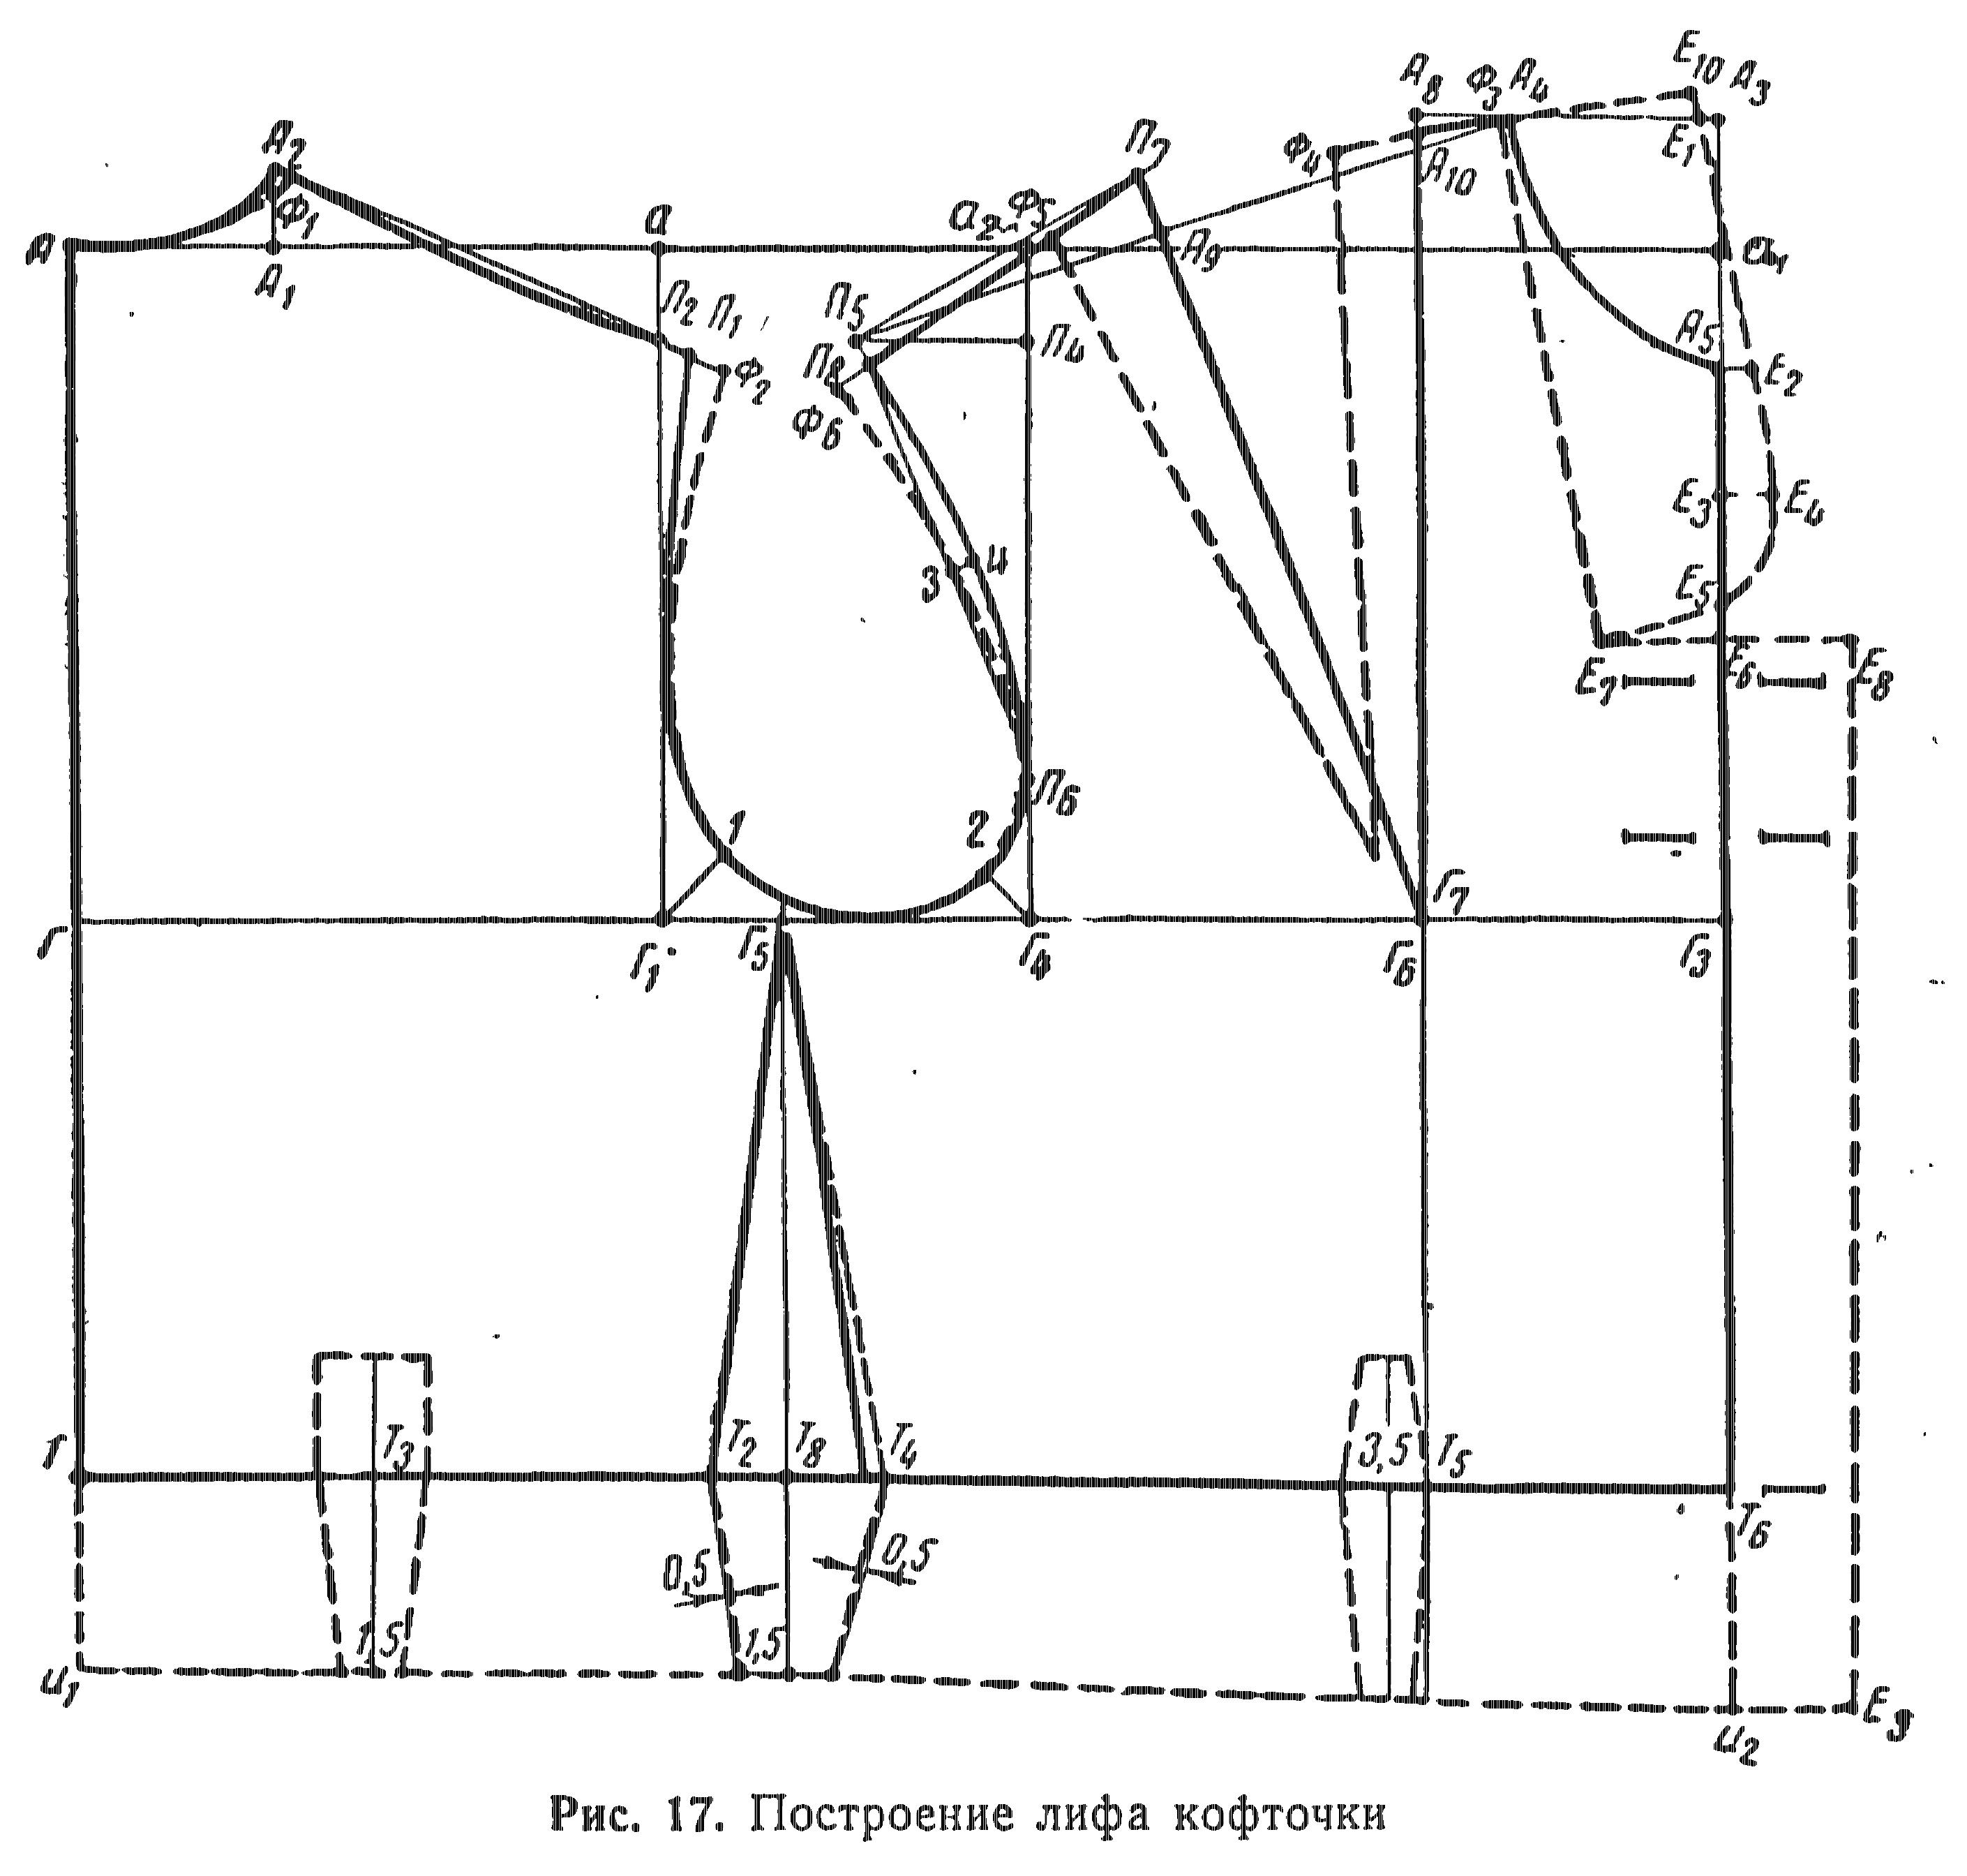 Построение выкройки сарафана девочки фото 636